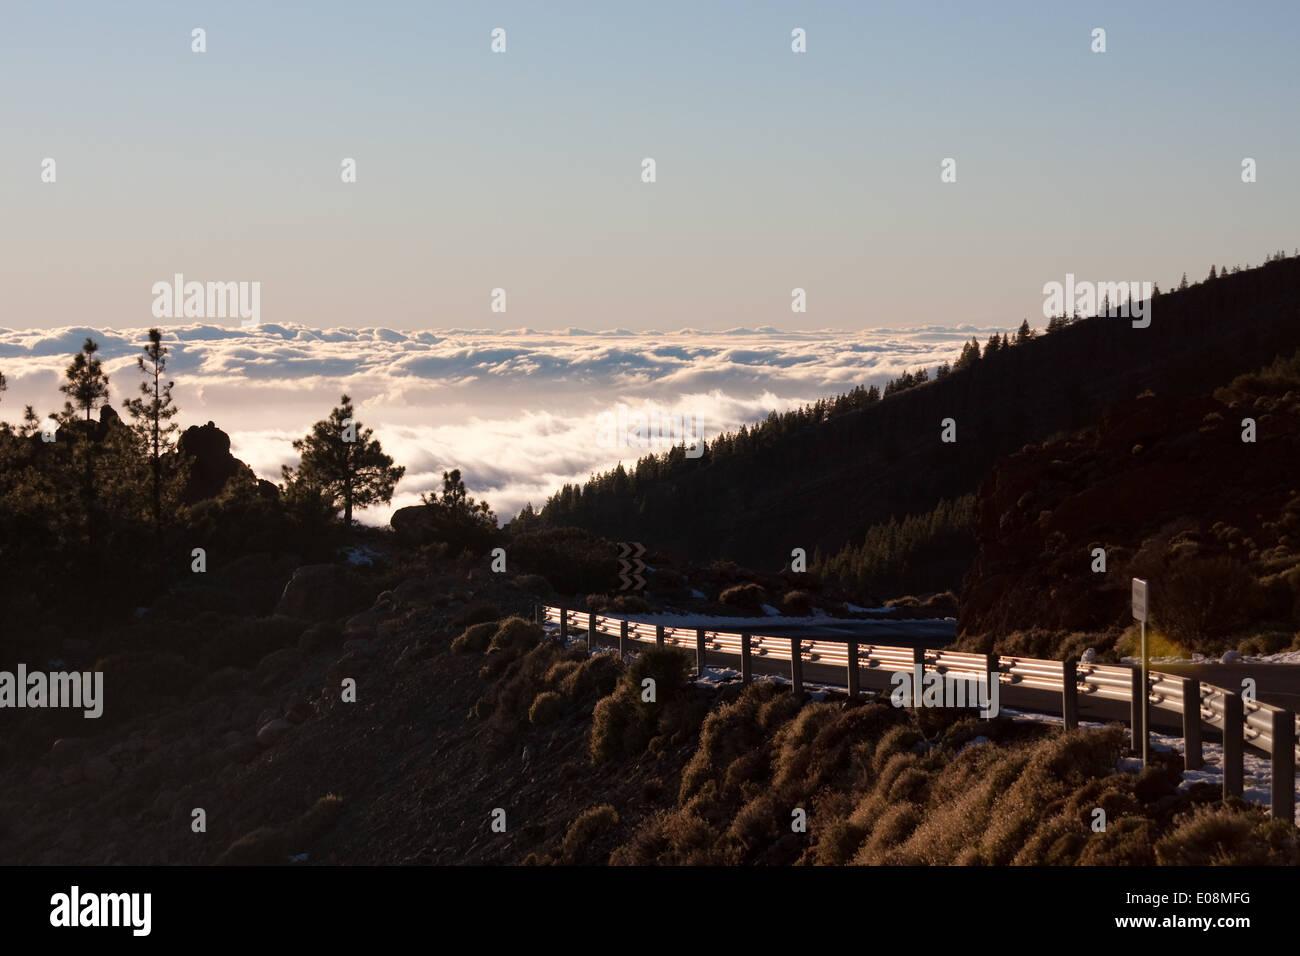 Cloud cover behind trees, Parque Nacional del Teide, Tenerife, Spain - Stock Image